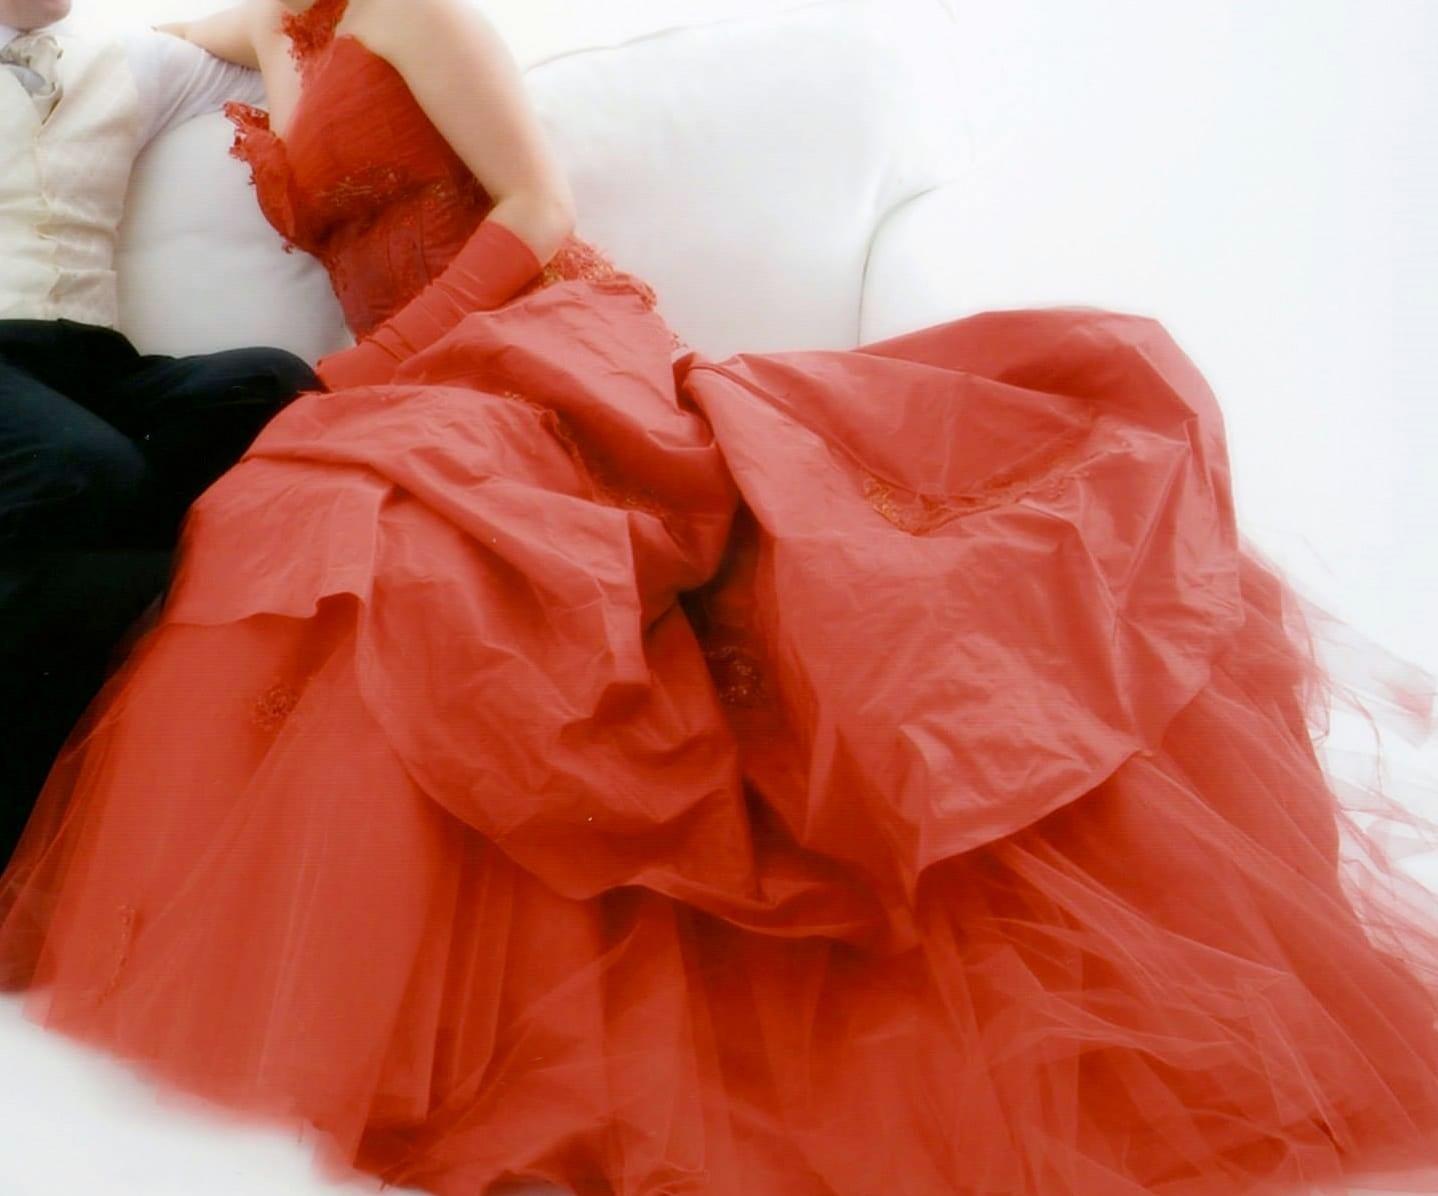 Farage wedding dress - Sell My Wedding Dress Online | Sell My ...